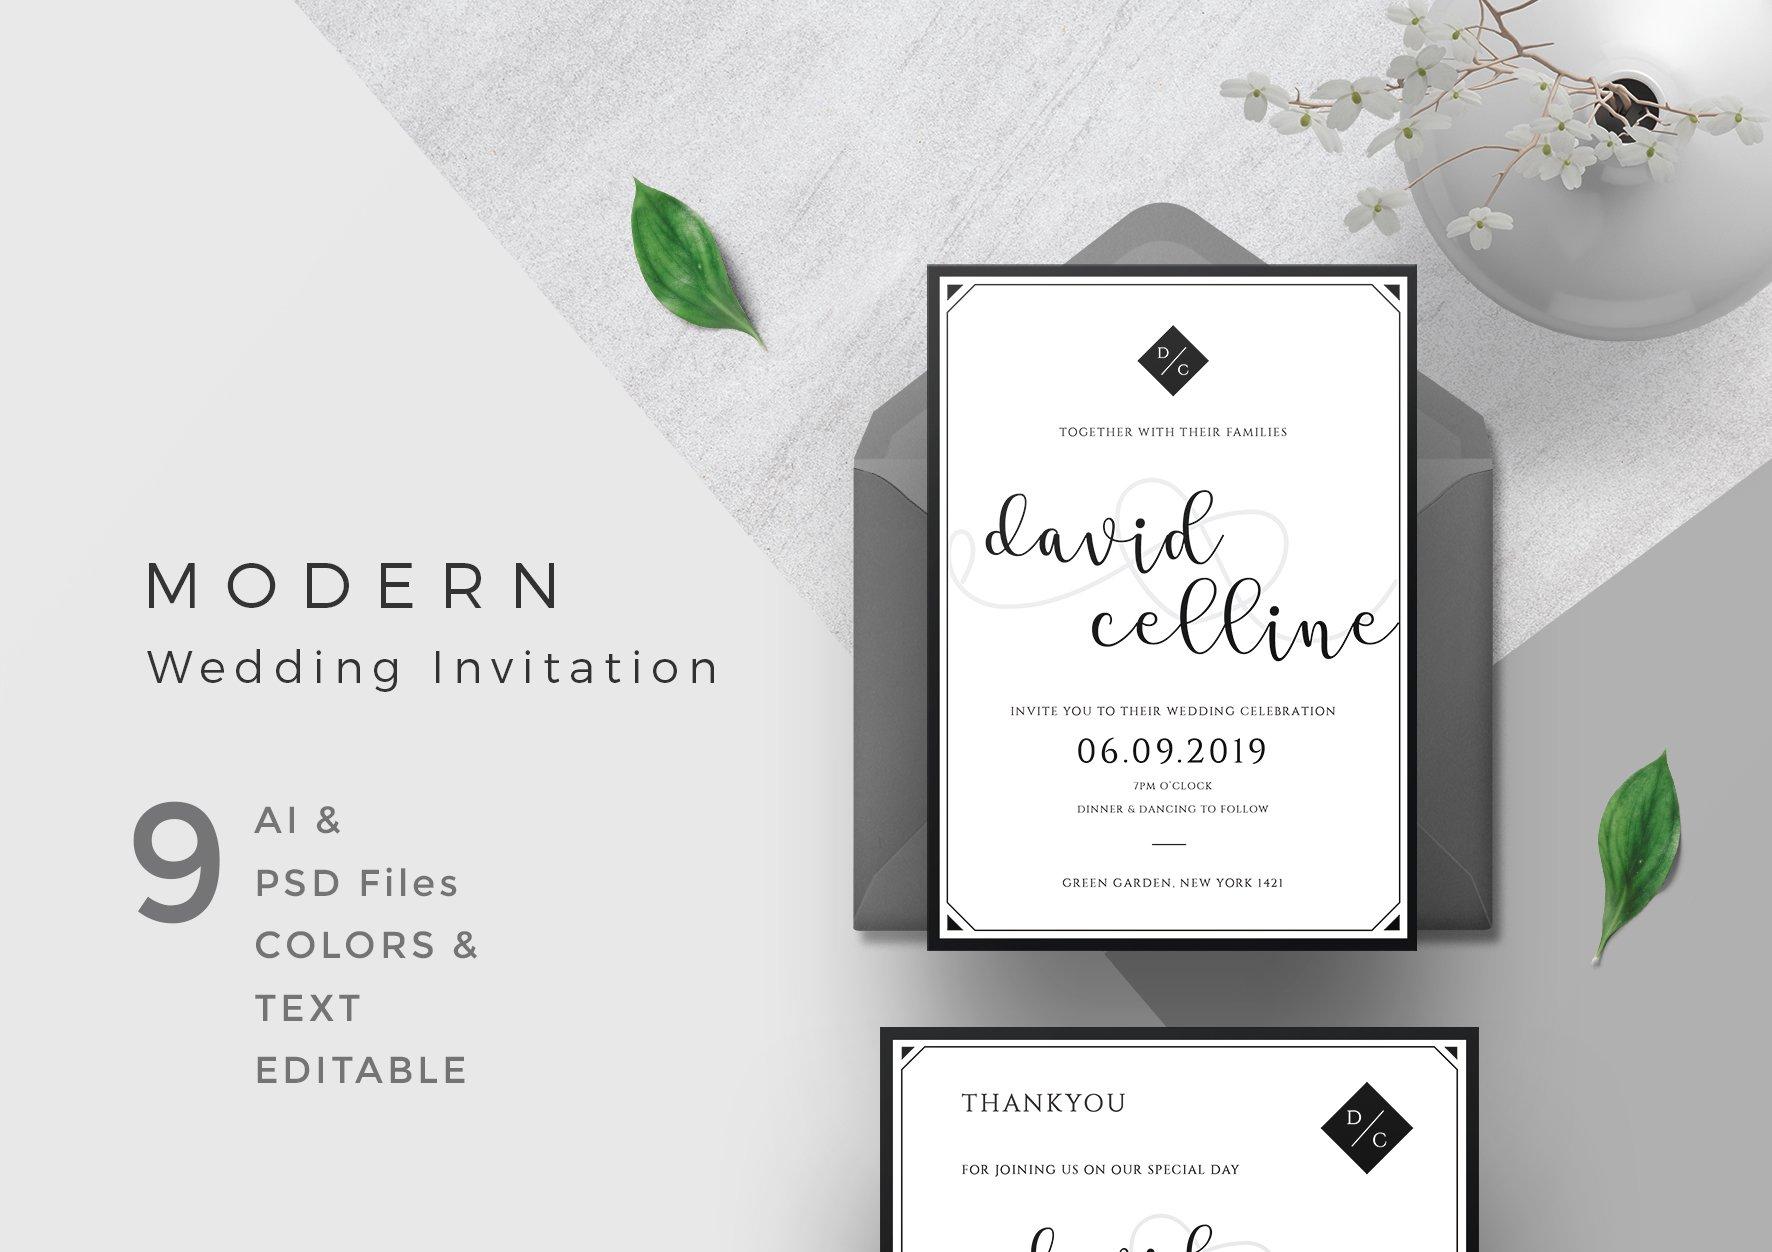 Modern Wedding Invitation ~ Invitation Templates ~ Creative Market